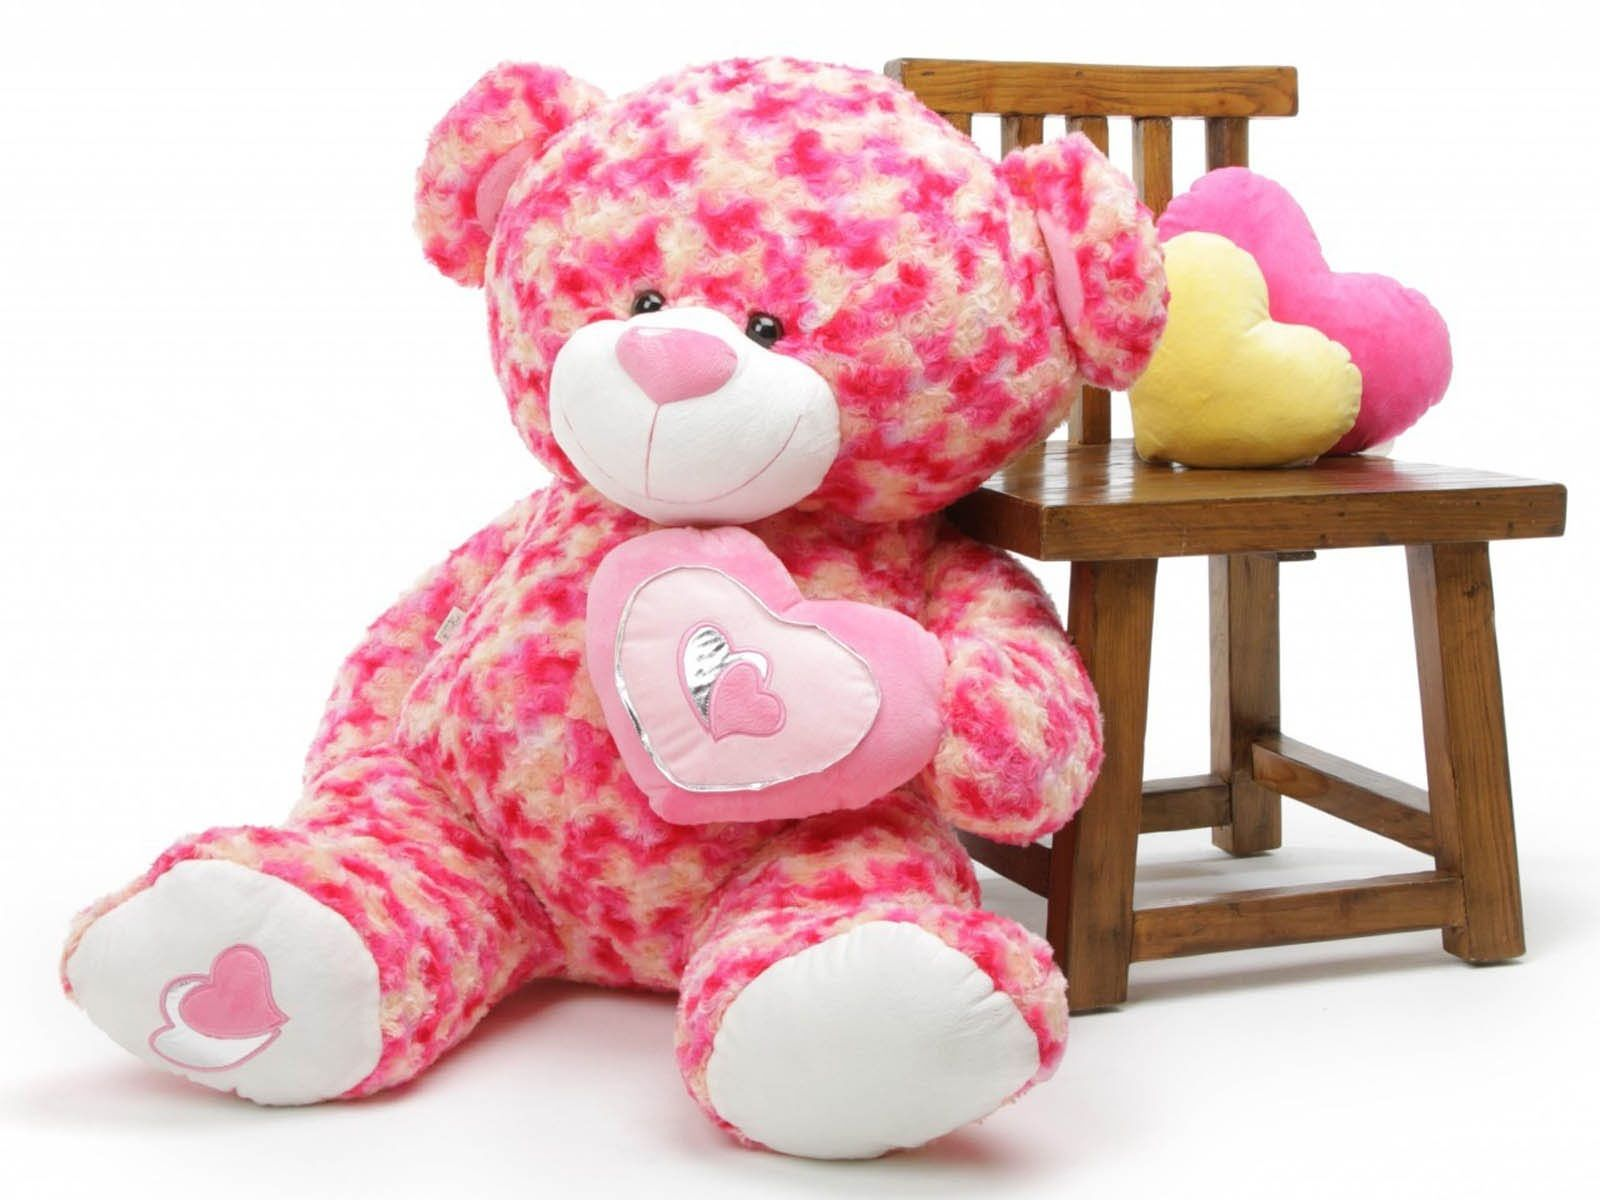 Pink Teddy Bear Hd Wallpaper Jpg 1600 1200 Teddy Bear Images Teddy Bear Pictures Teddy Bear Wallpaper